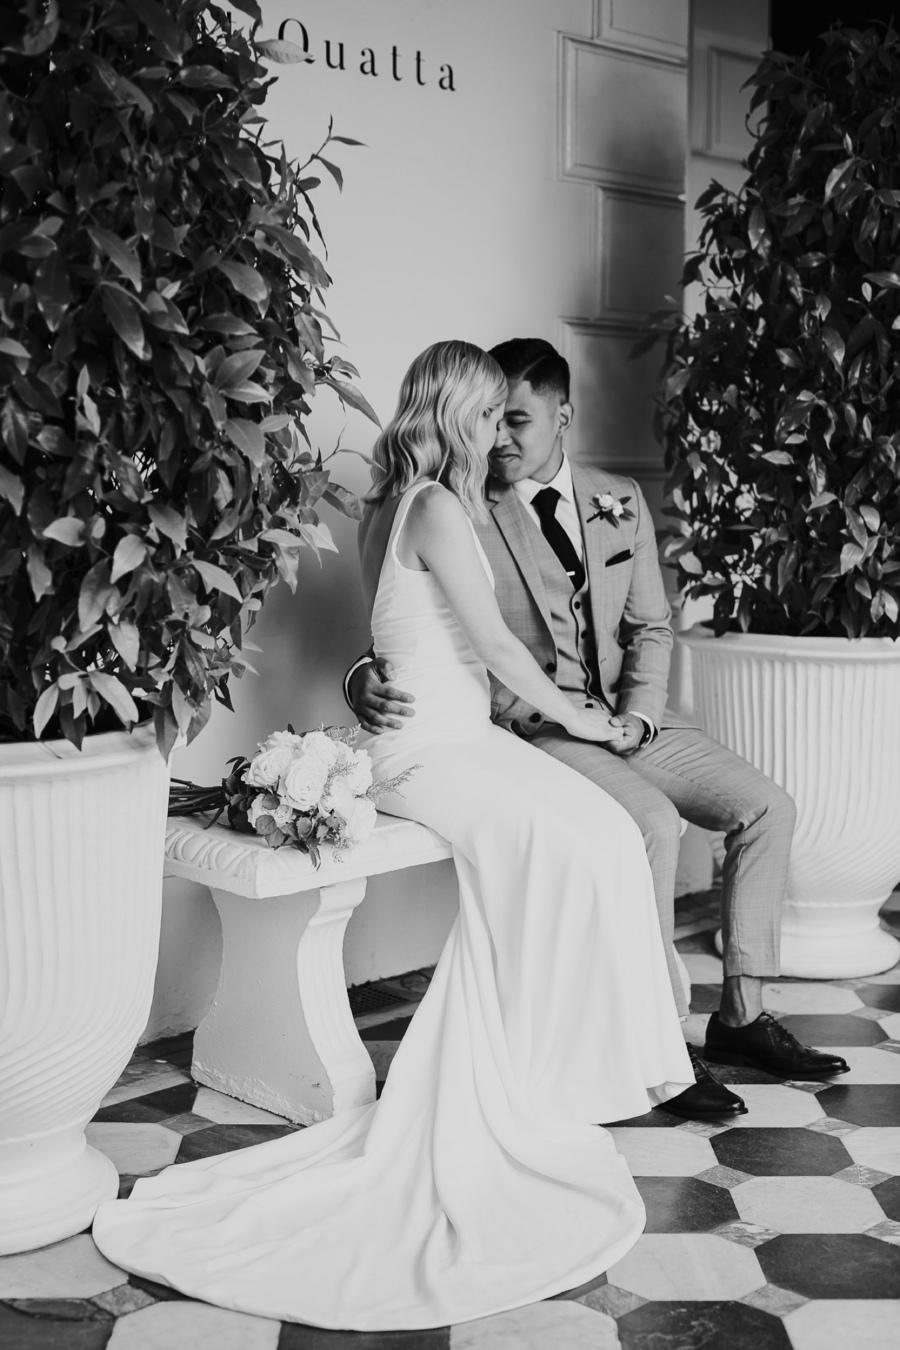 Quat Quatta Melbourne Wedding Photography77.jpg